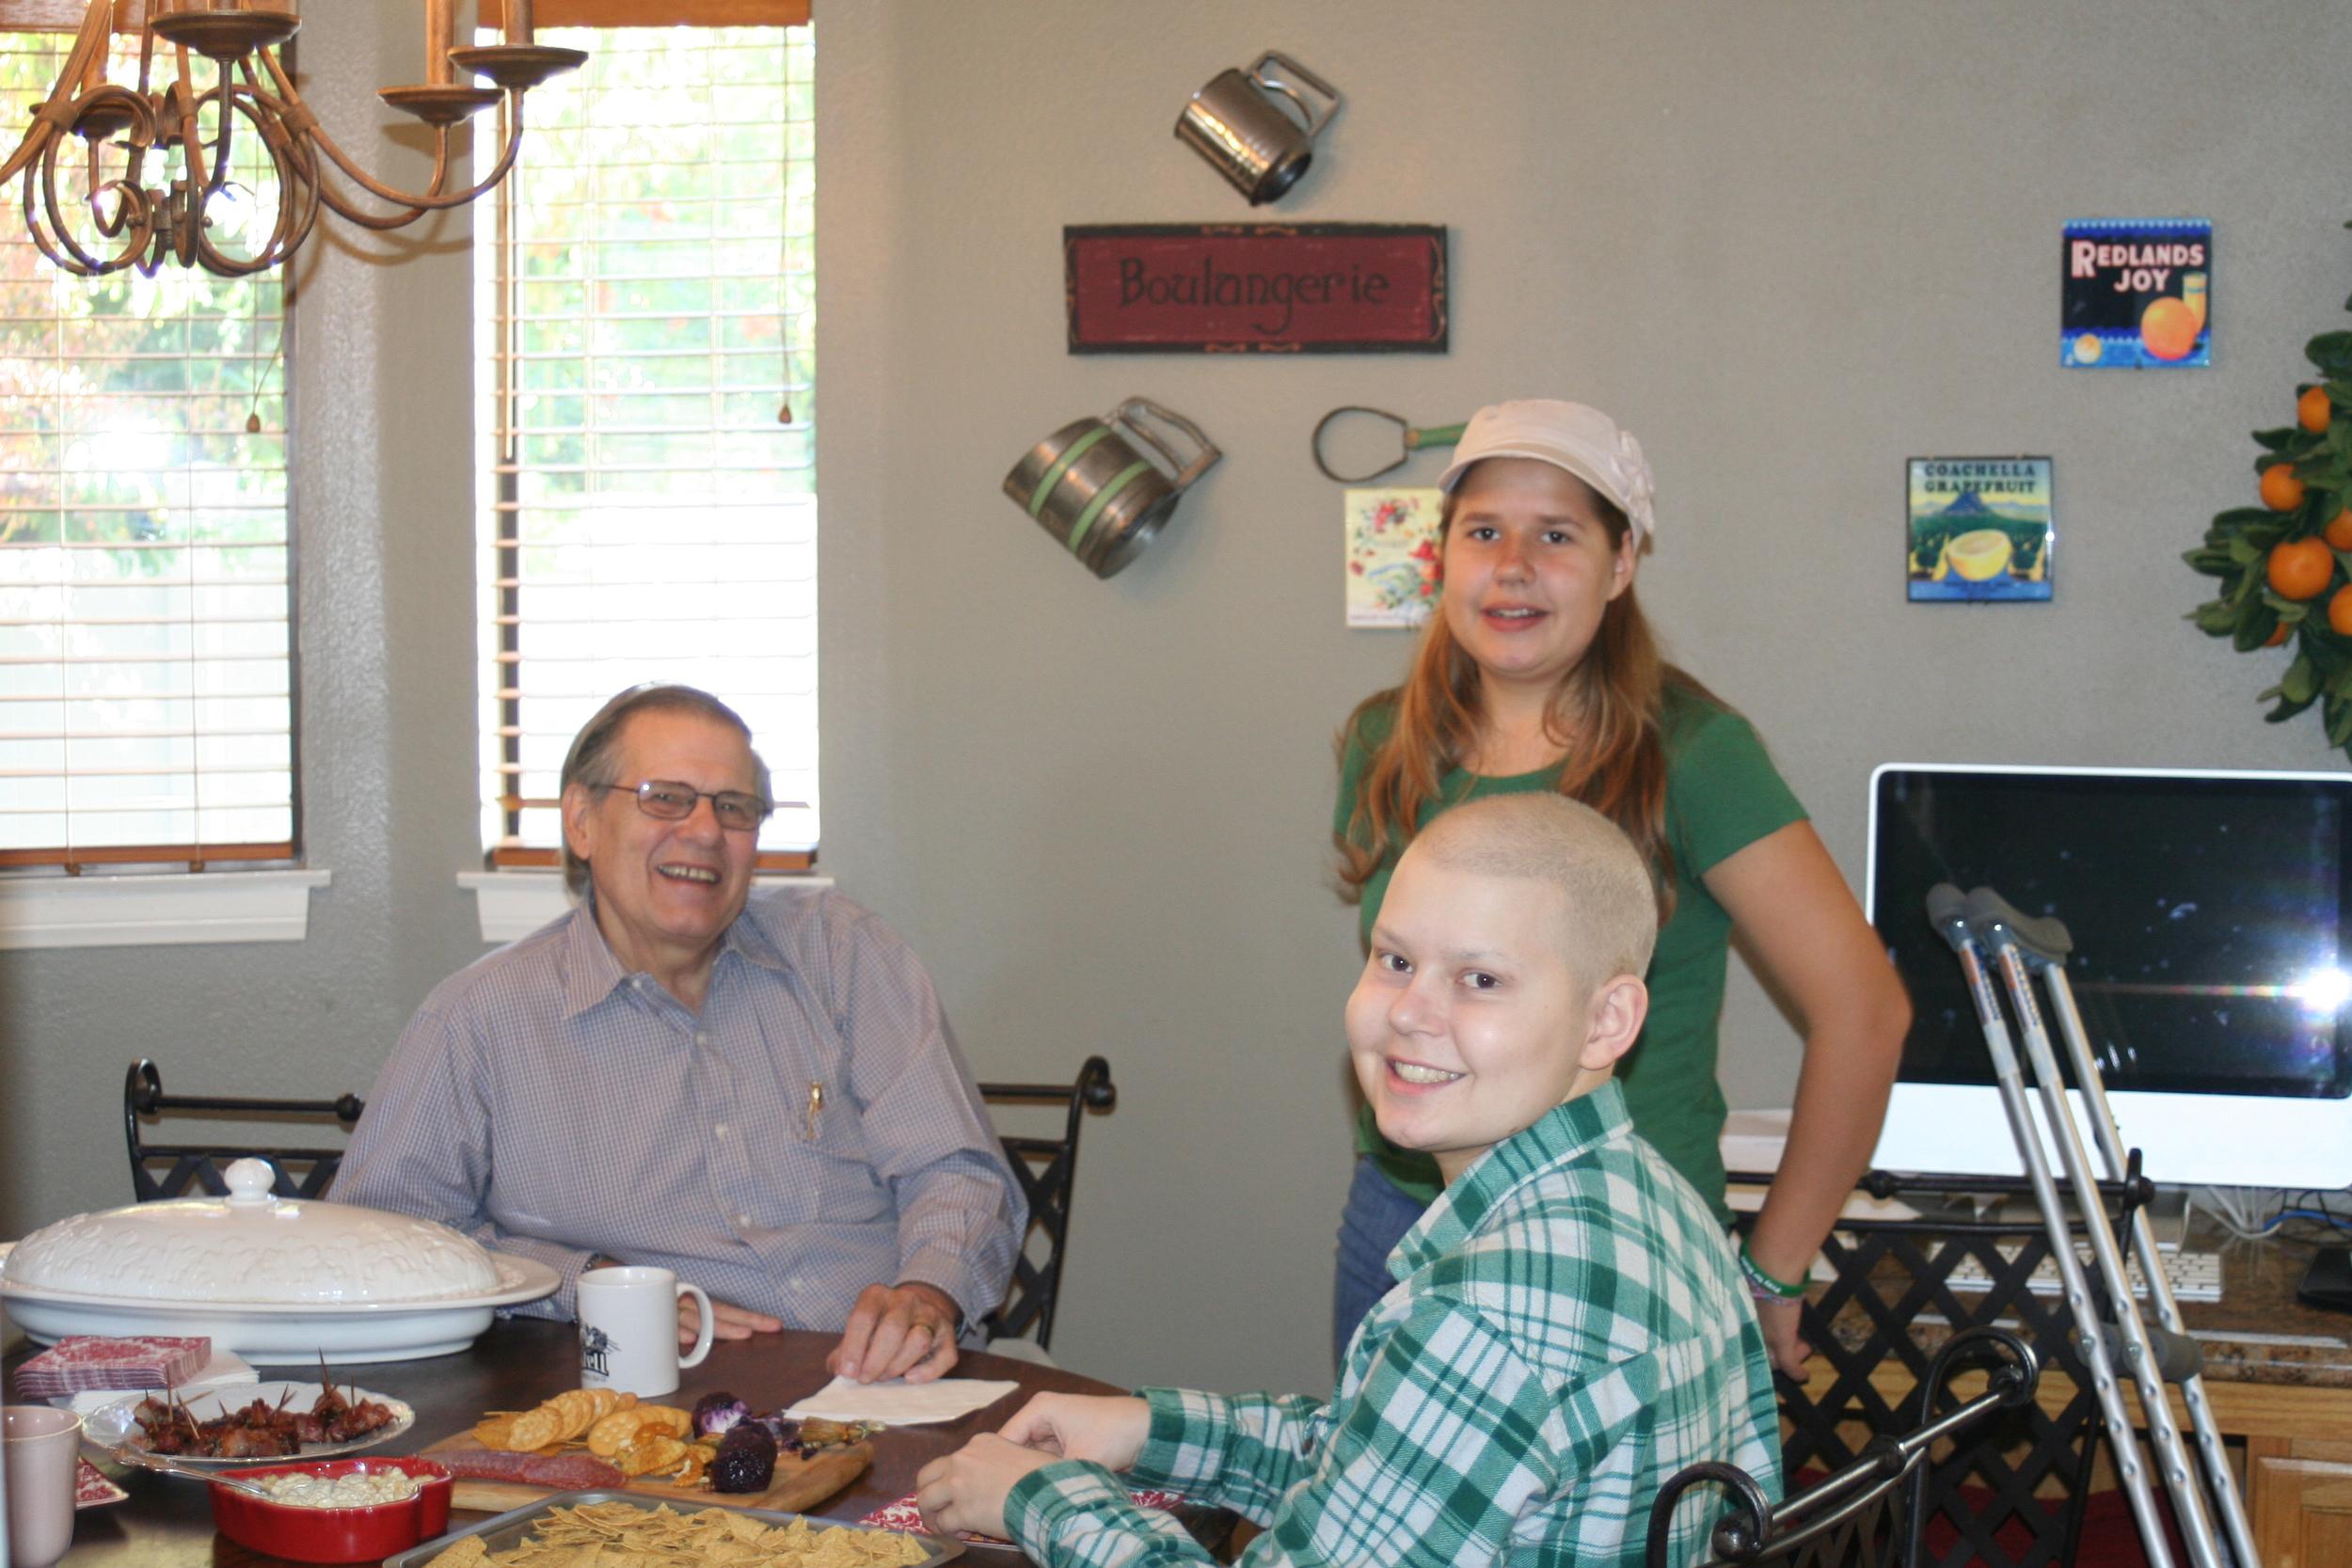 Grandpa Derksen with Victoria and Blake